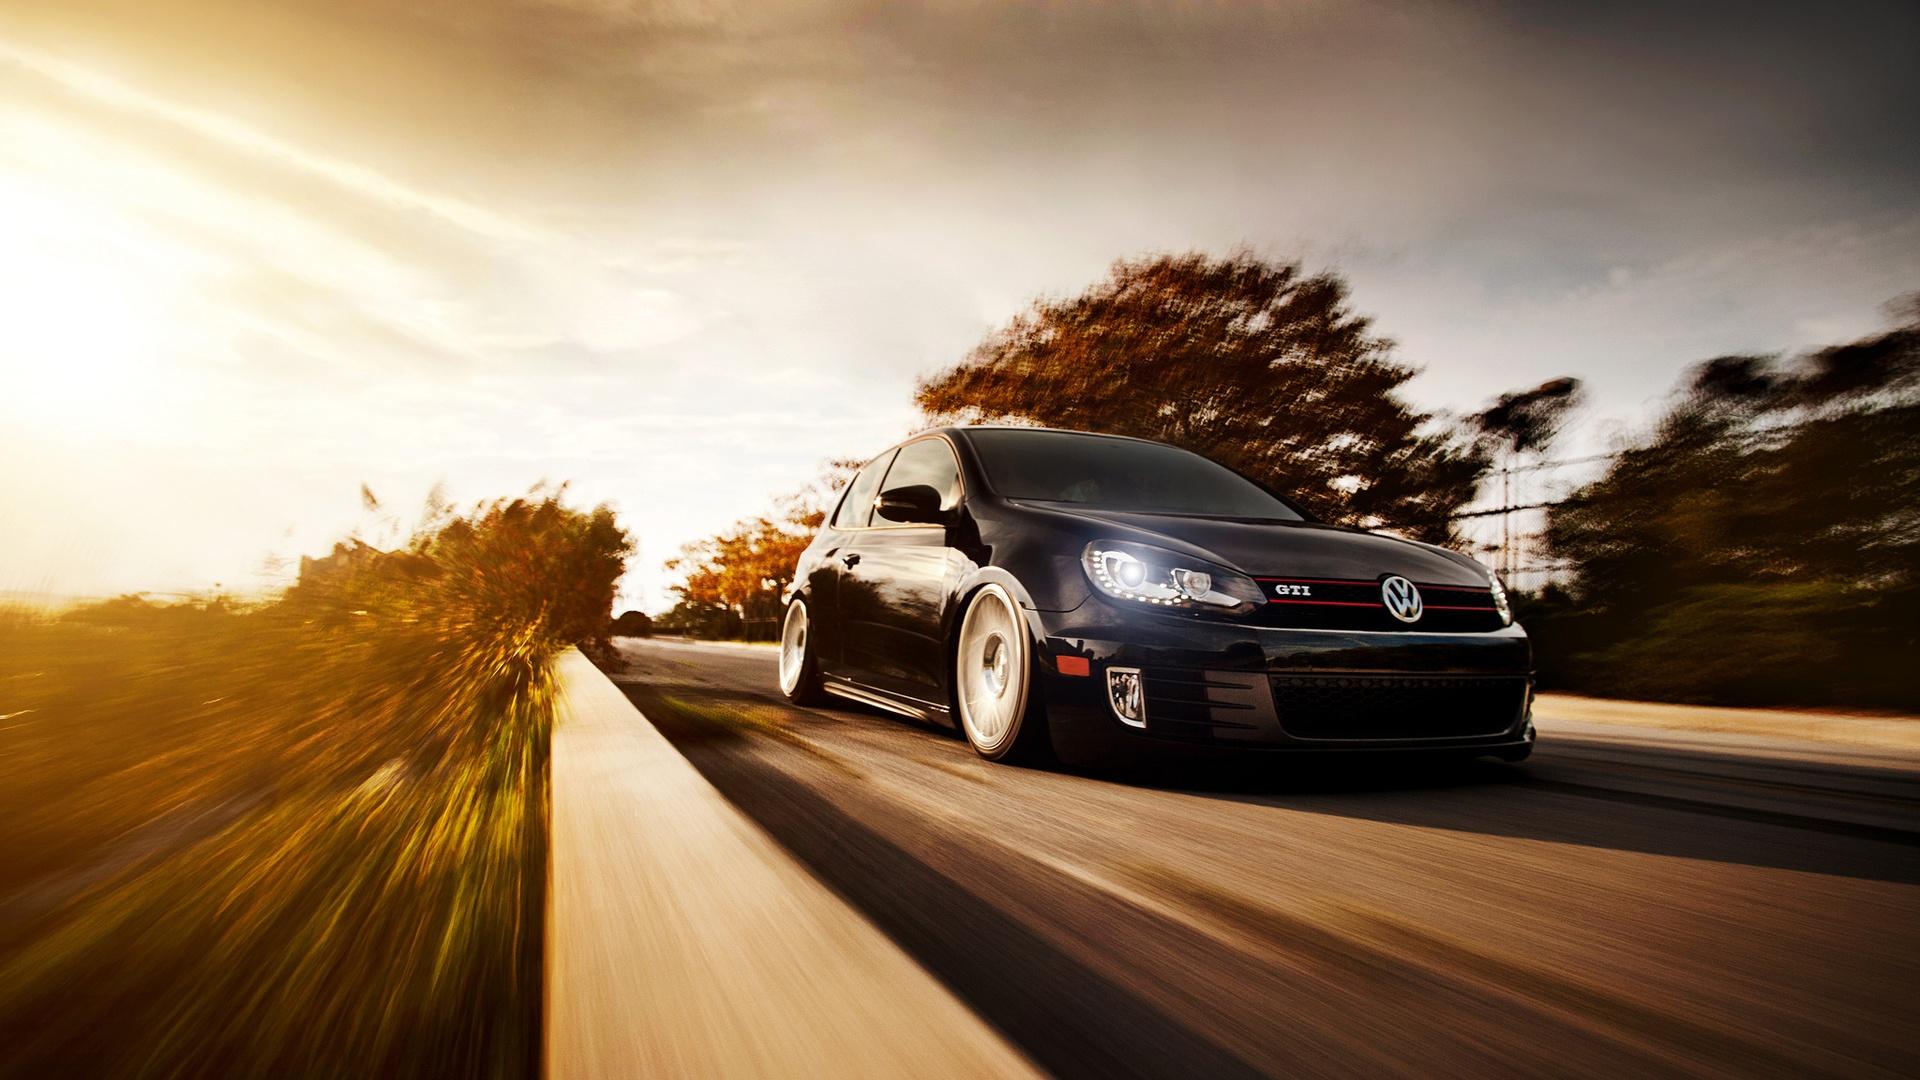 Wallpaper Volkswagen Golf GTI, black color car, road ...